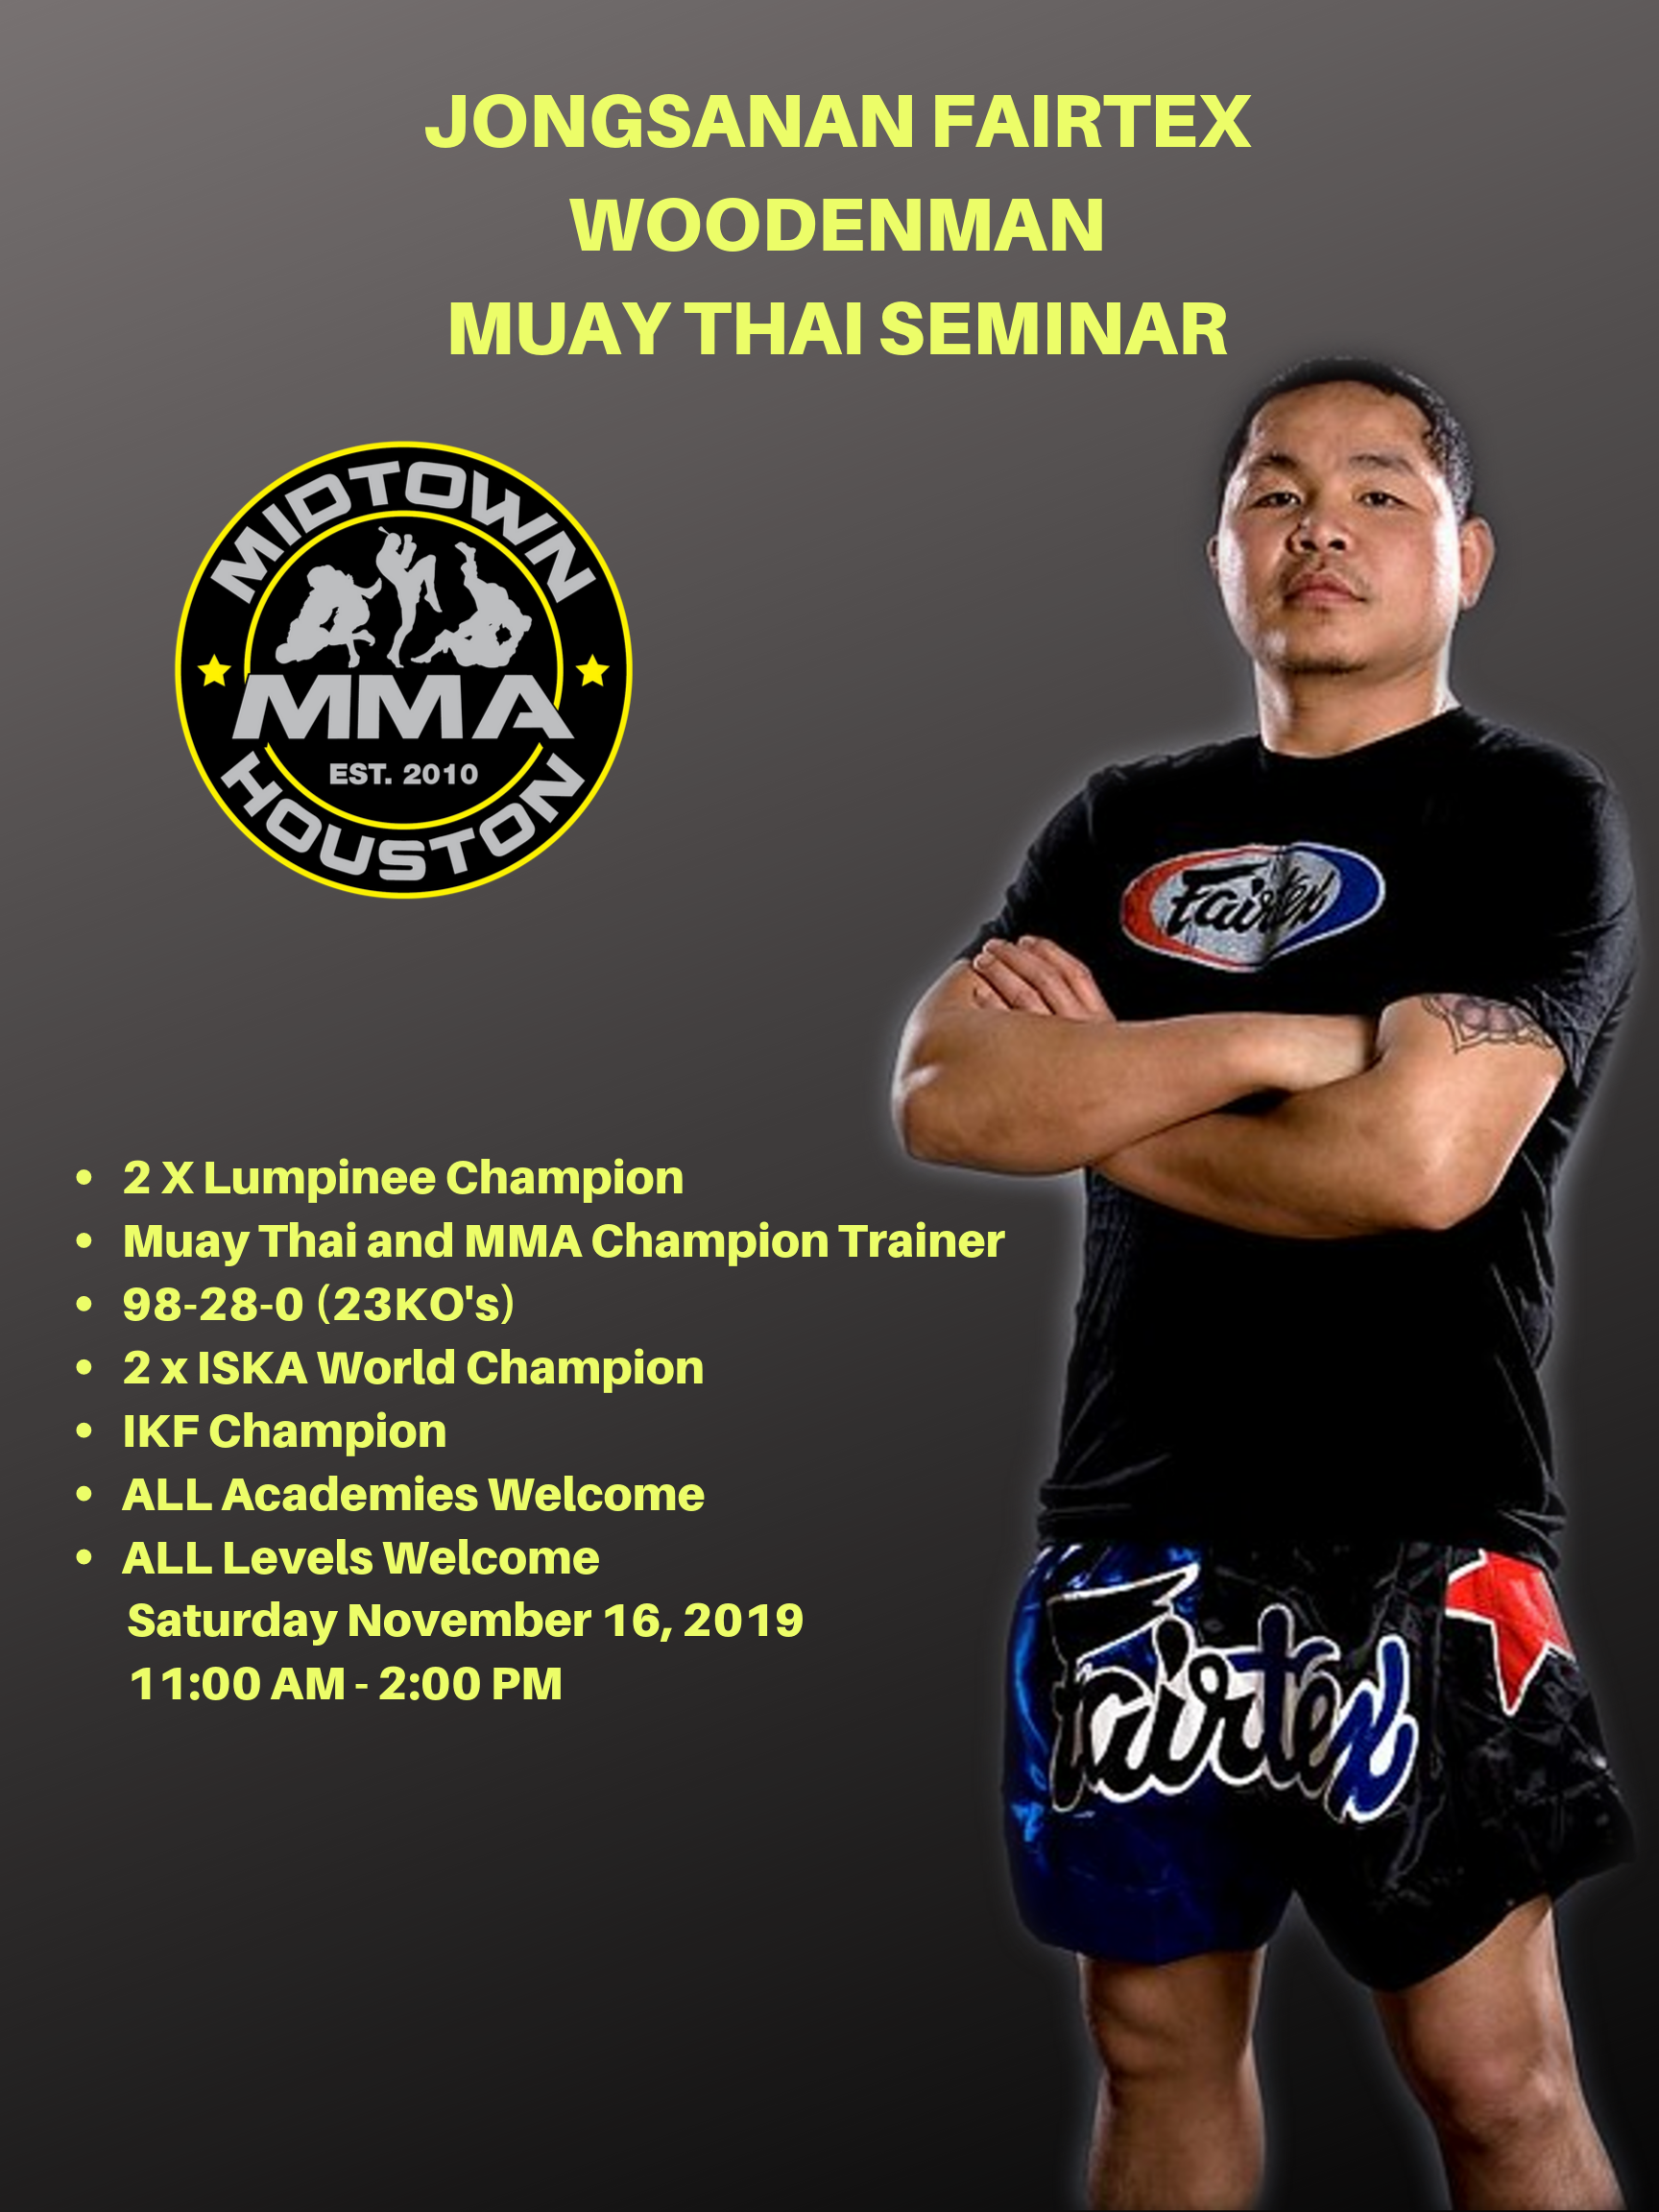 2 X Lumpinee Champion Muay Thai and MMA Chipion Trainer (1)